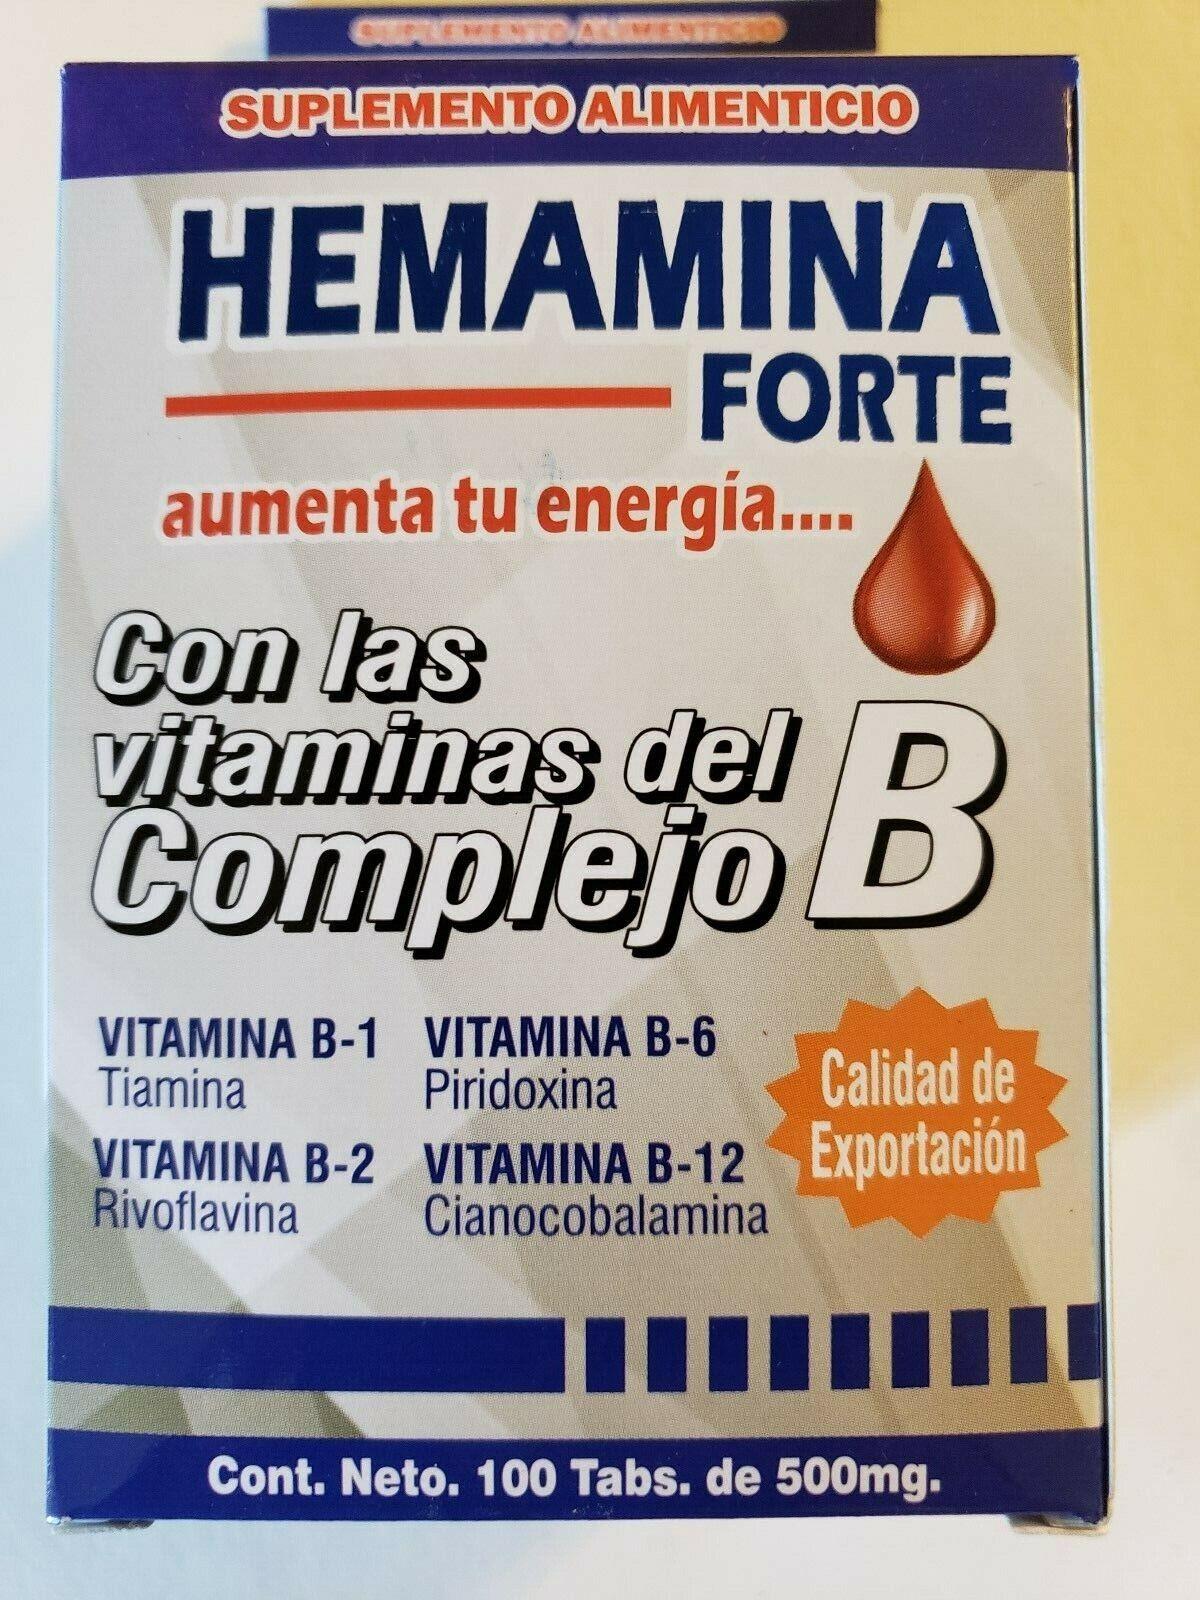 HEMAMINA FORTE ENERGY BOOSTER/ COMPLEJO B ENERGIZANTE 100 TABLETAS 500MG.